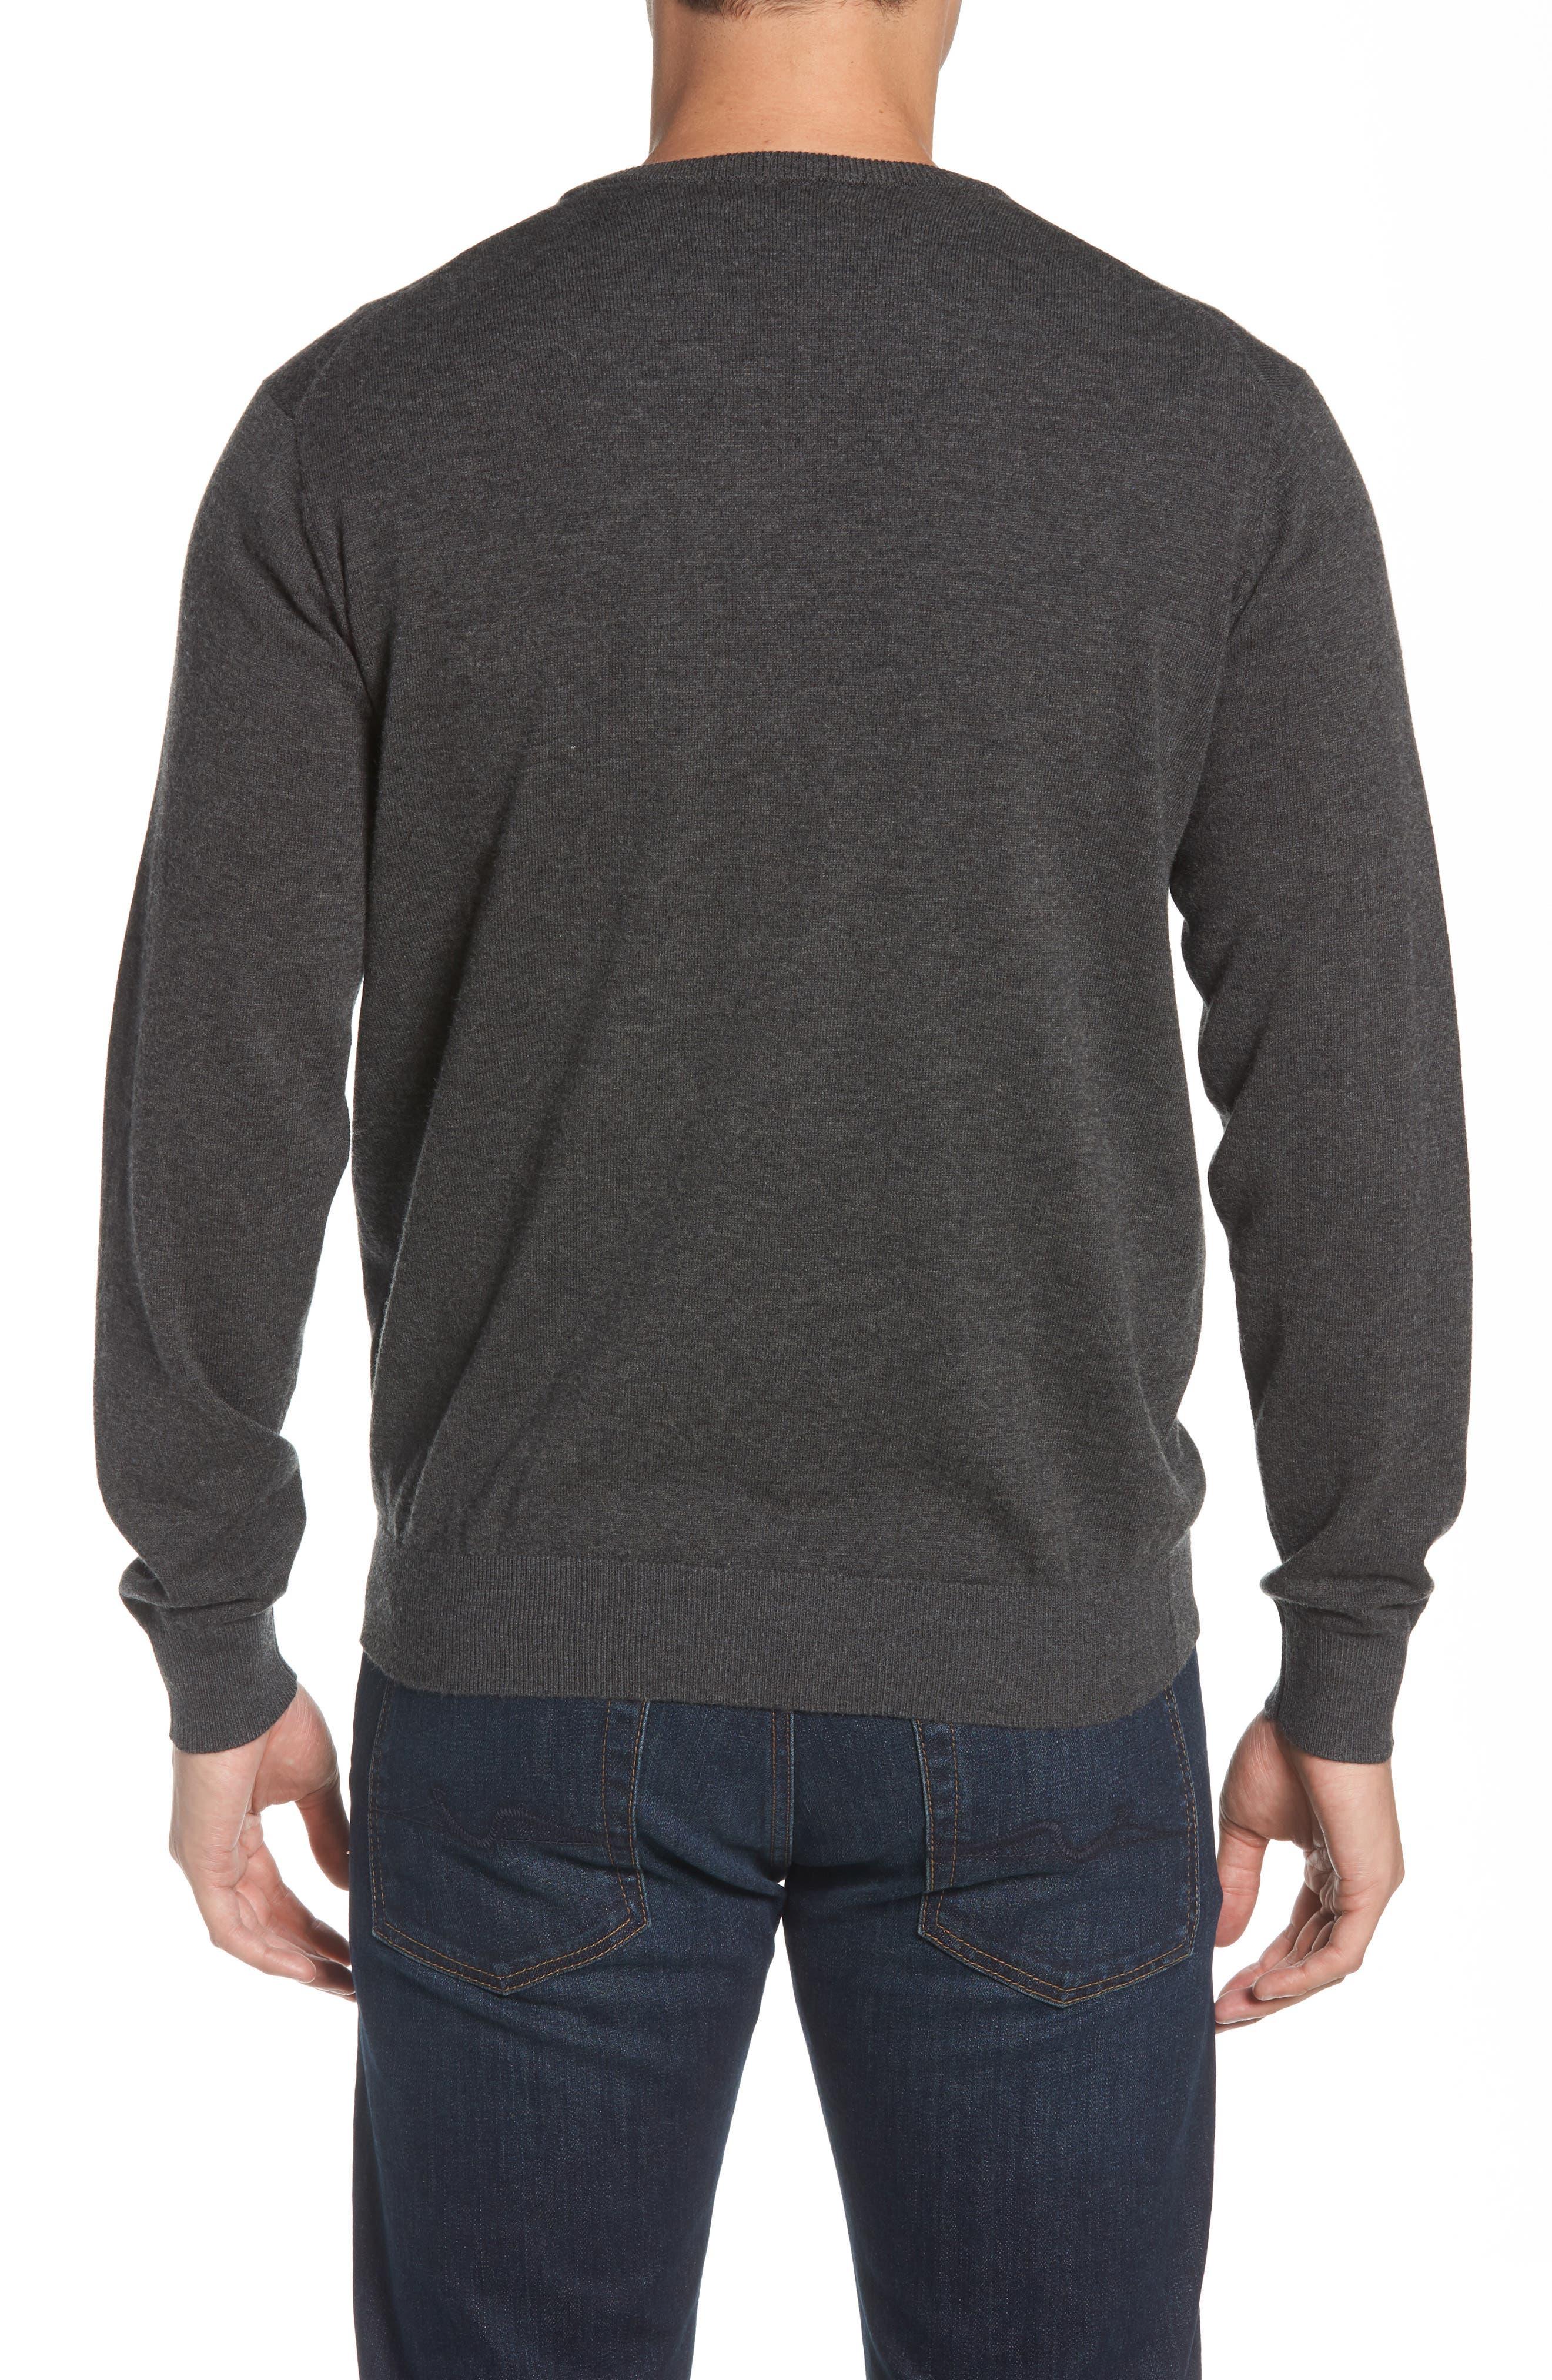 Wool & Cotton Crewneck Sweater,                             Alternate thumbnail 2, color,                             022